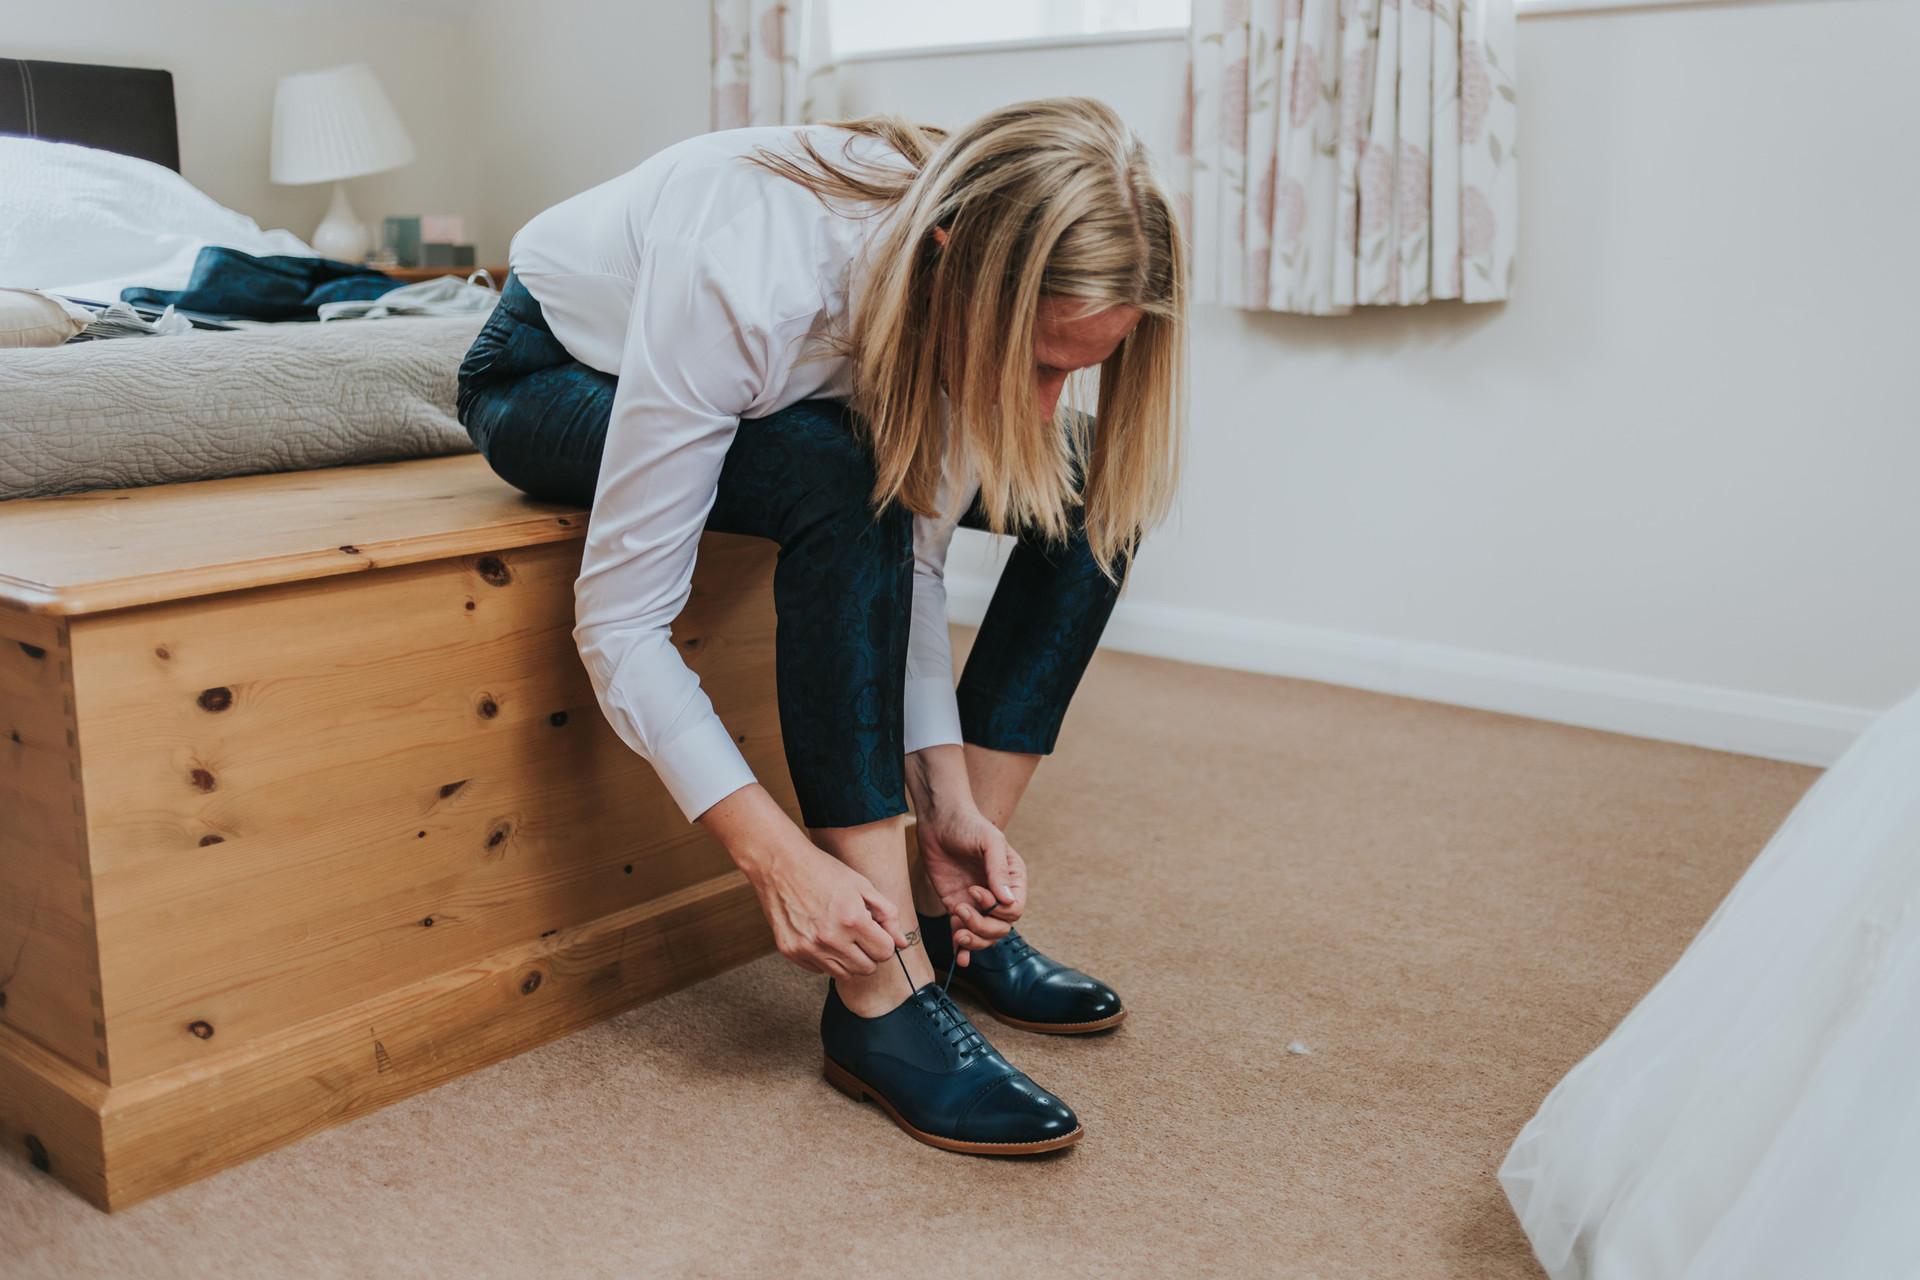 bride fastening her wedding shoes